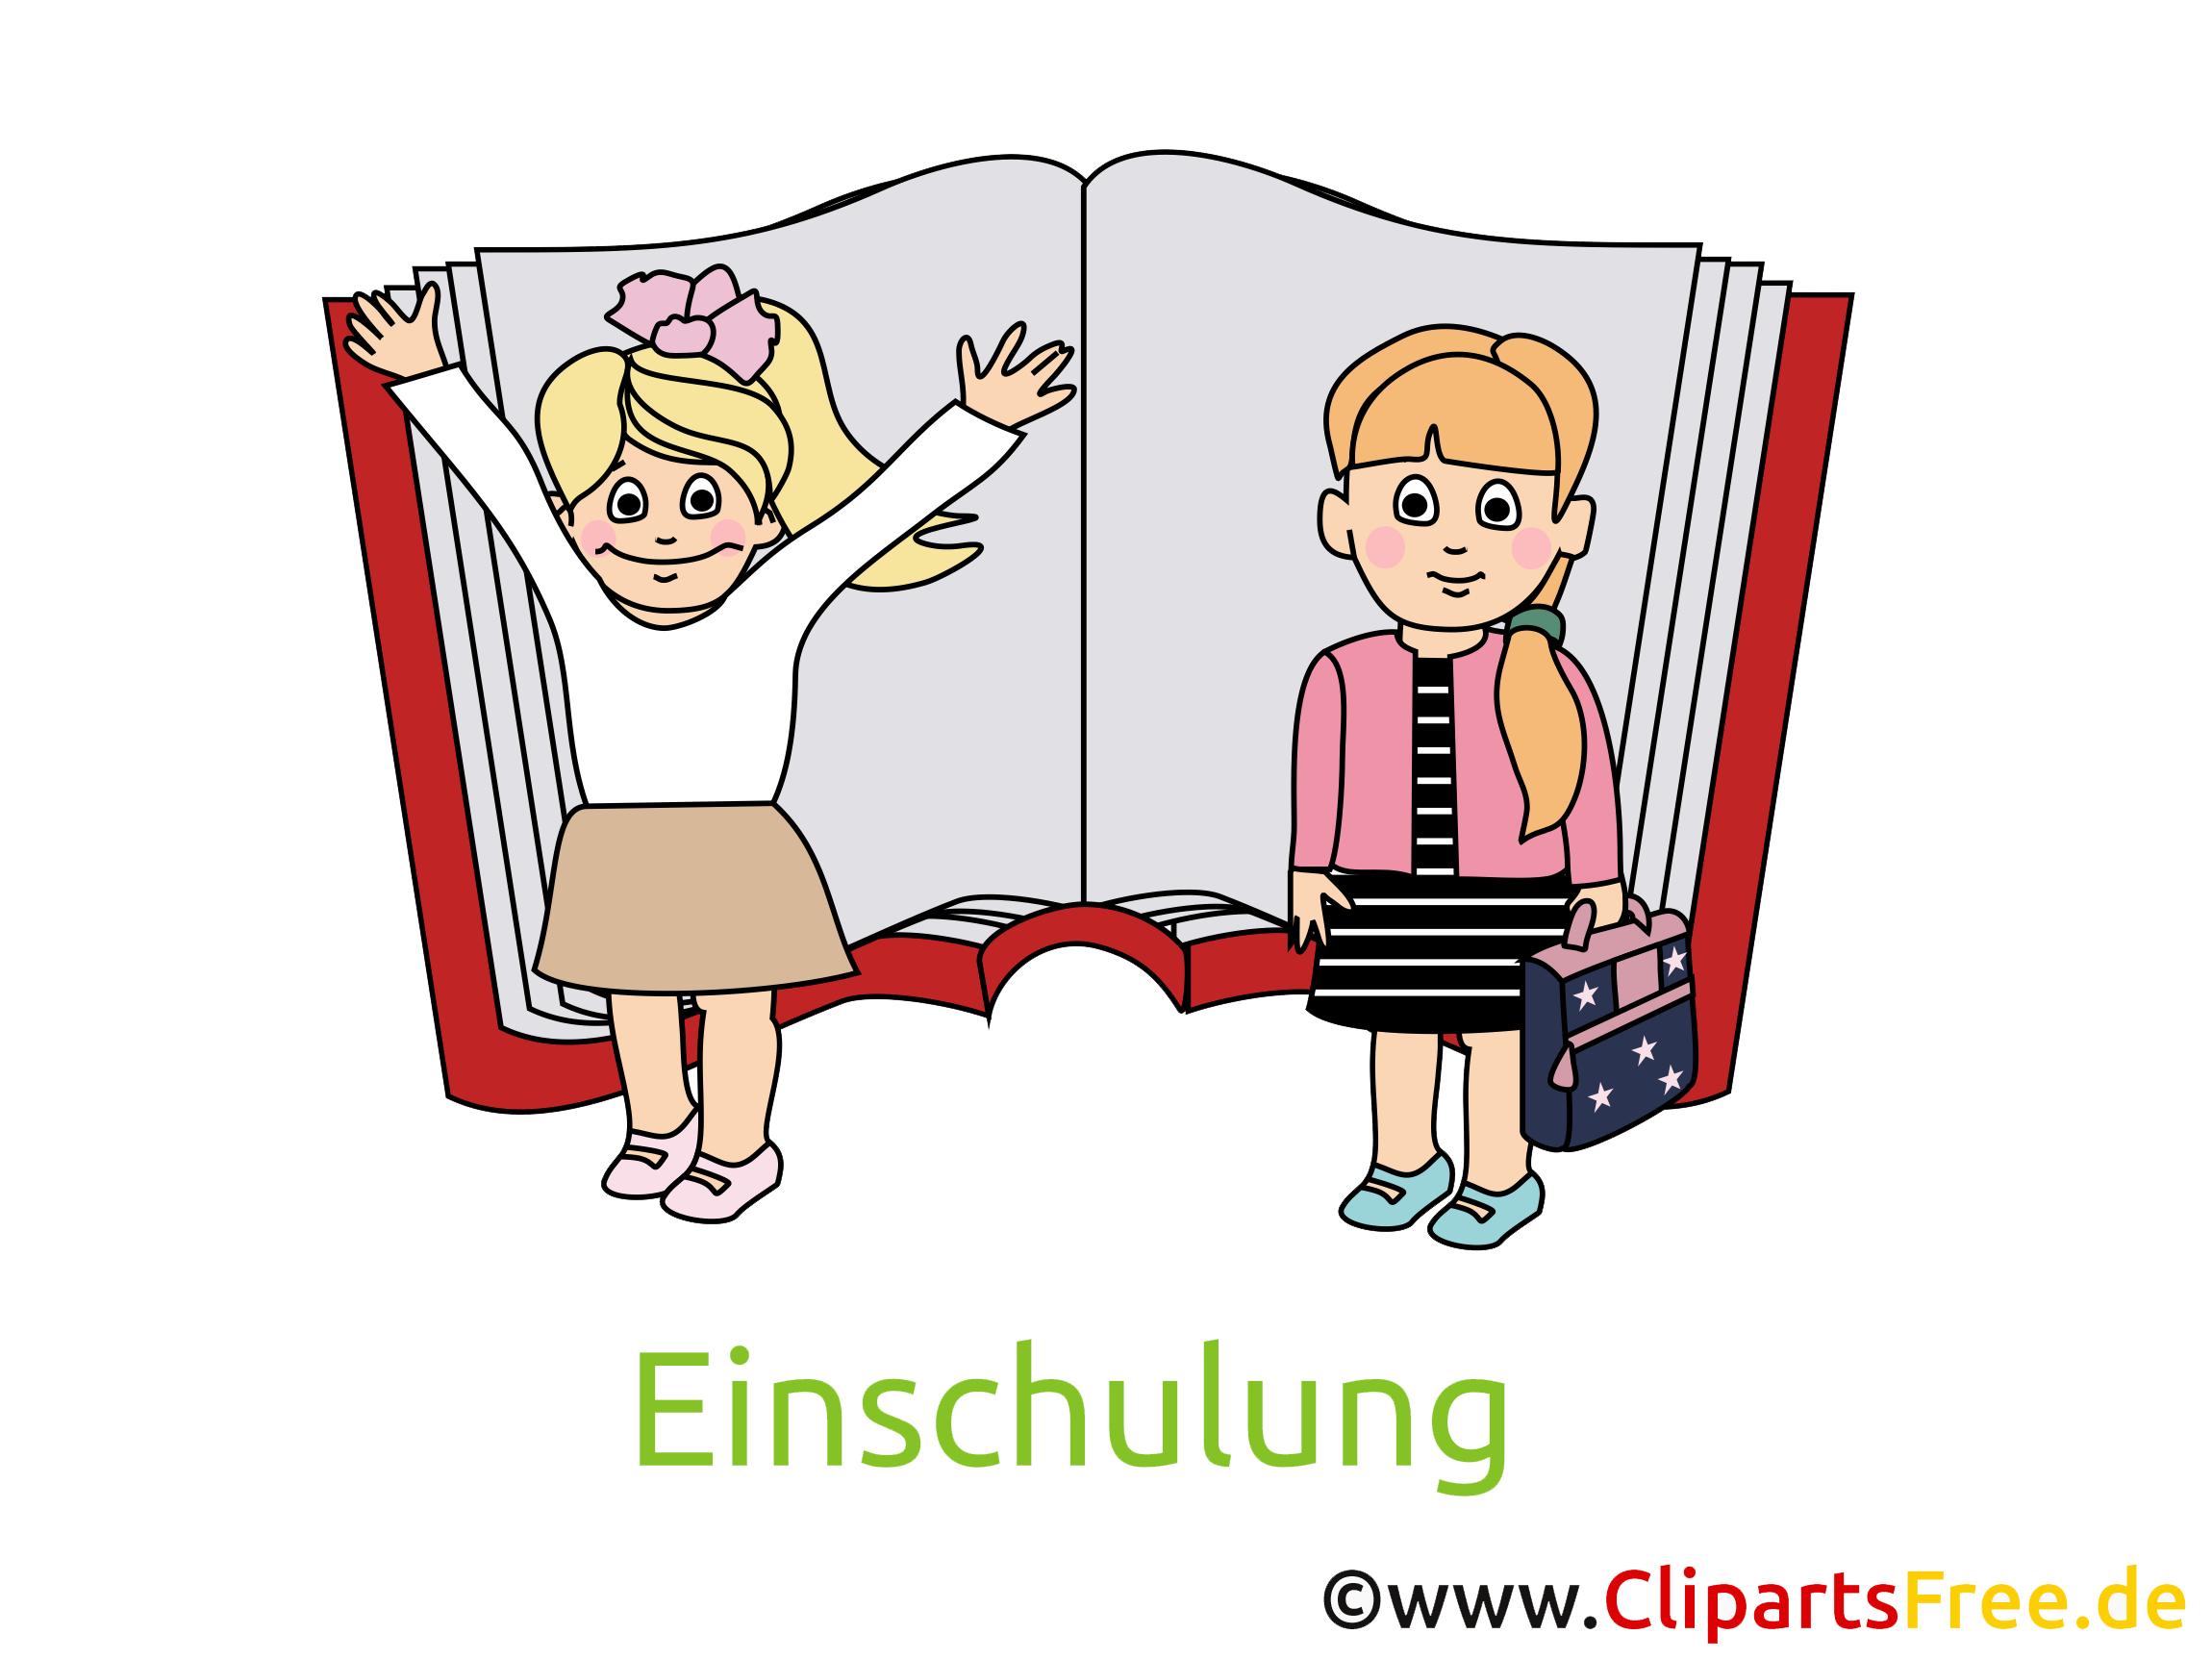 Clipart kostenlos schulanfang graphic transparent Cliparts Einschulung, Schulanfang kostenlos graphic transparent